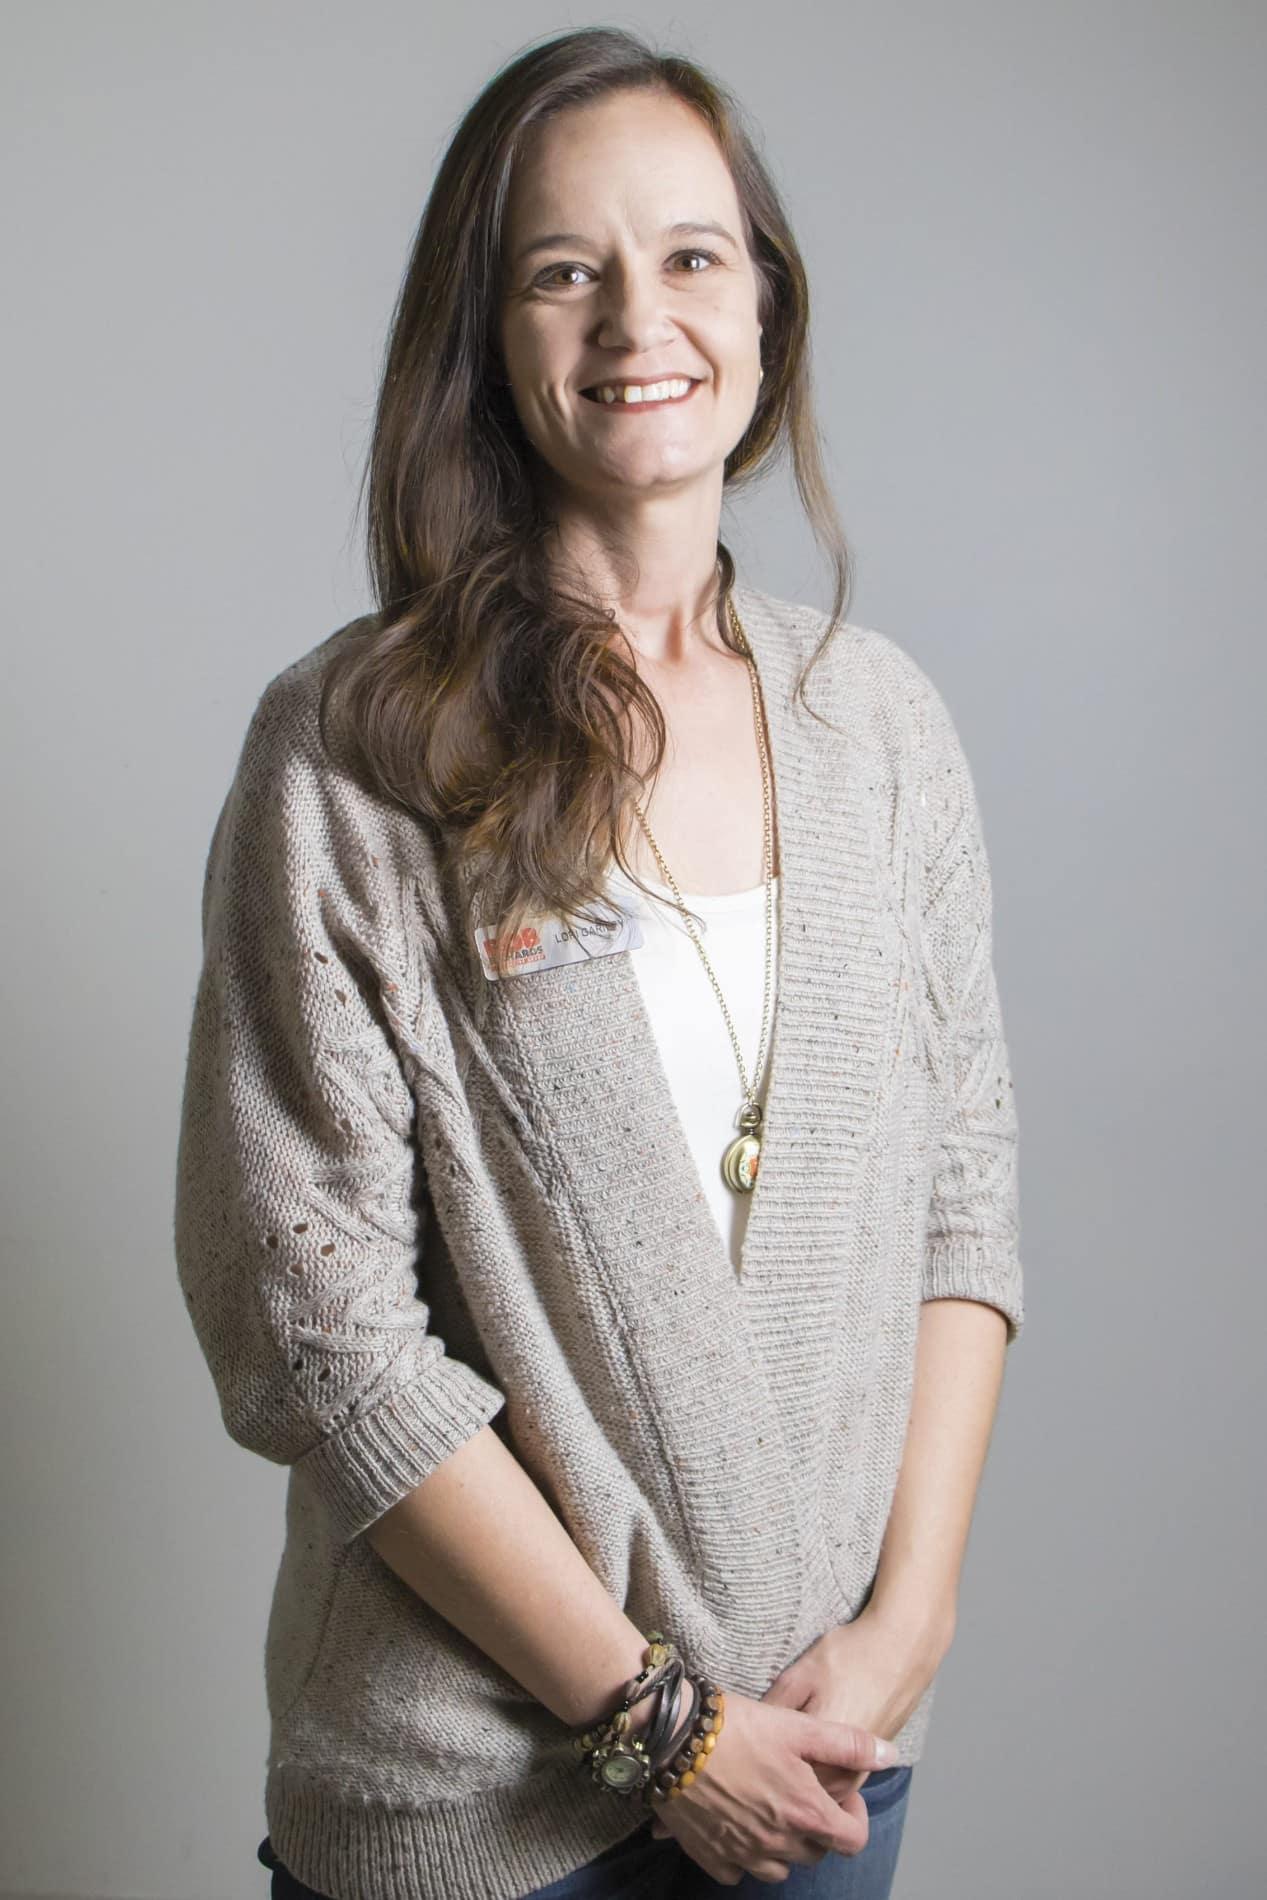 Lori Gariepy